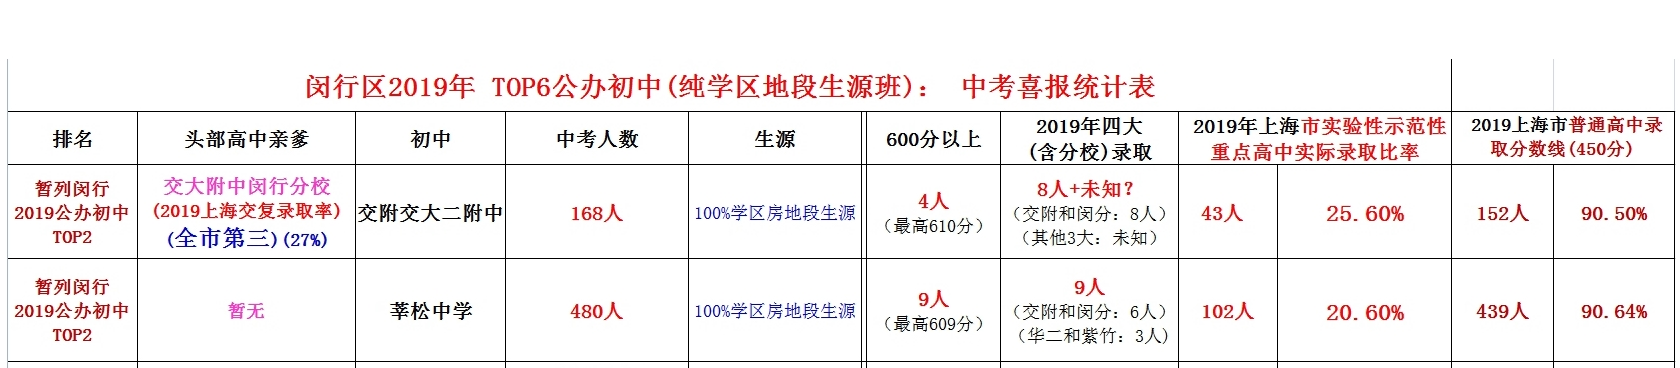 TOP2 闵行.jpg